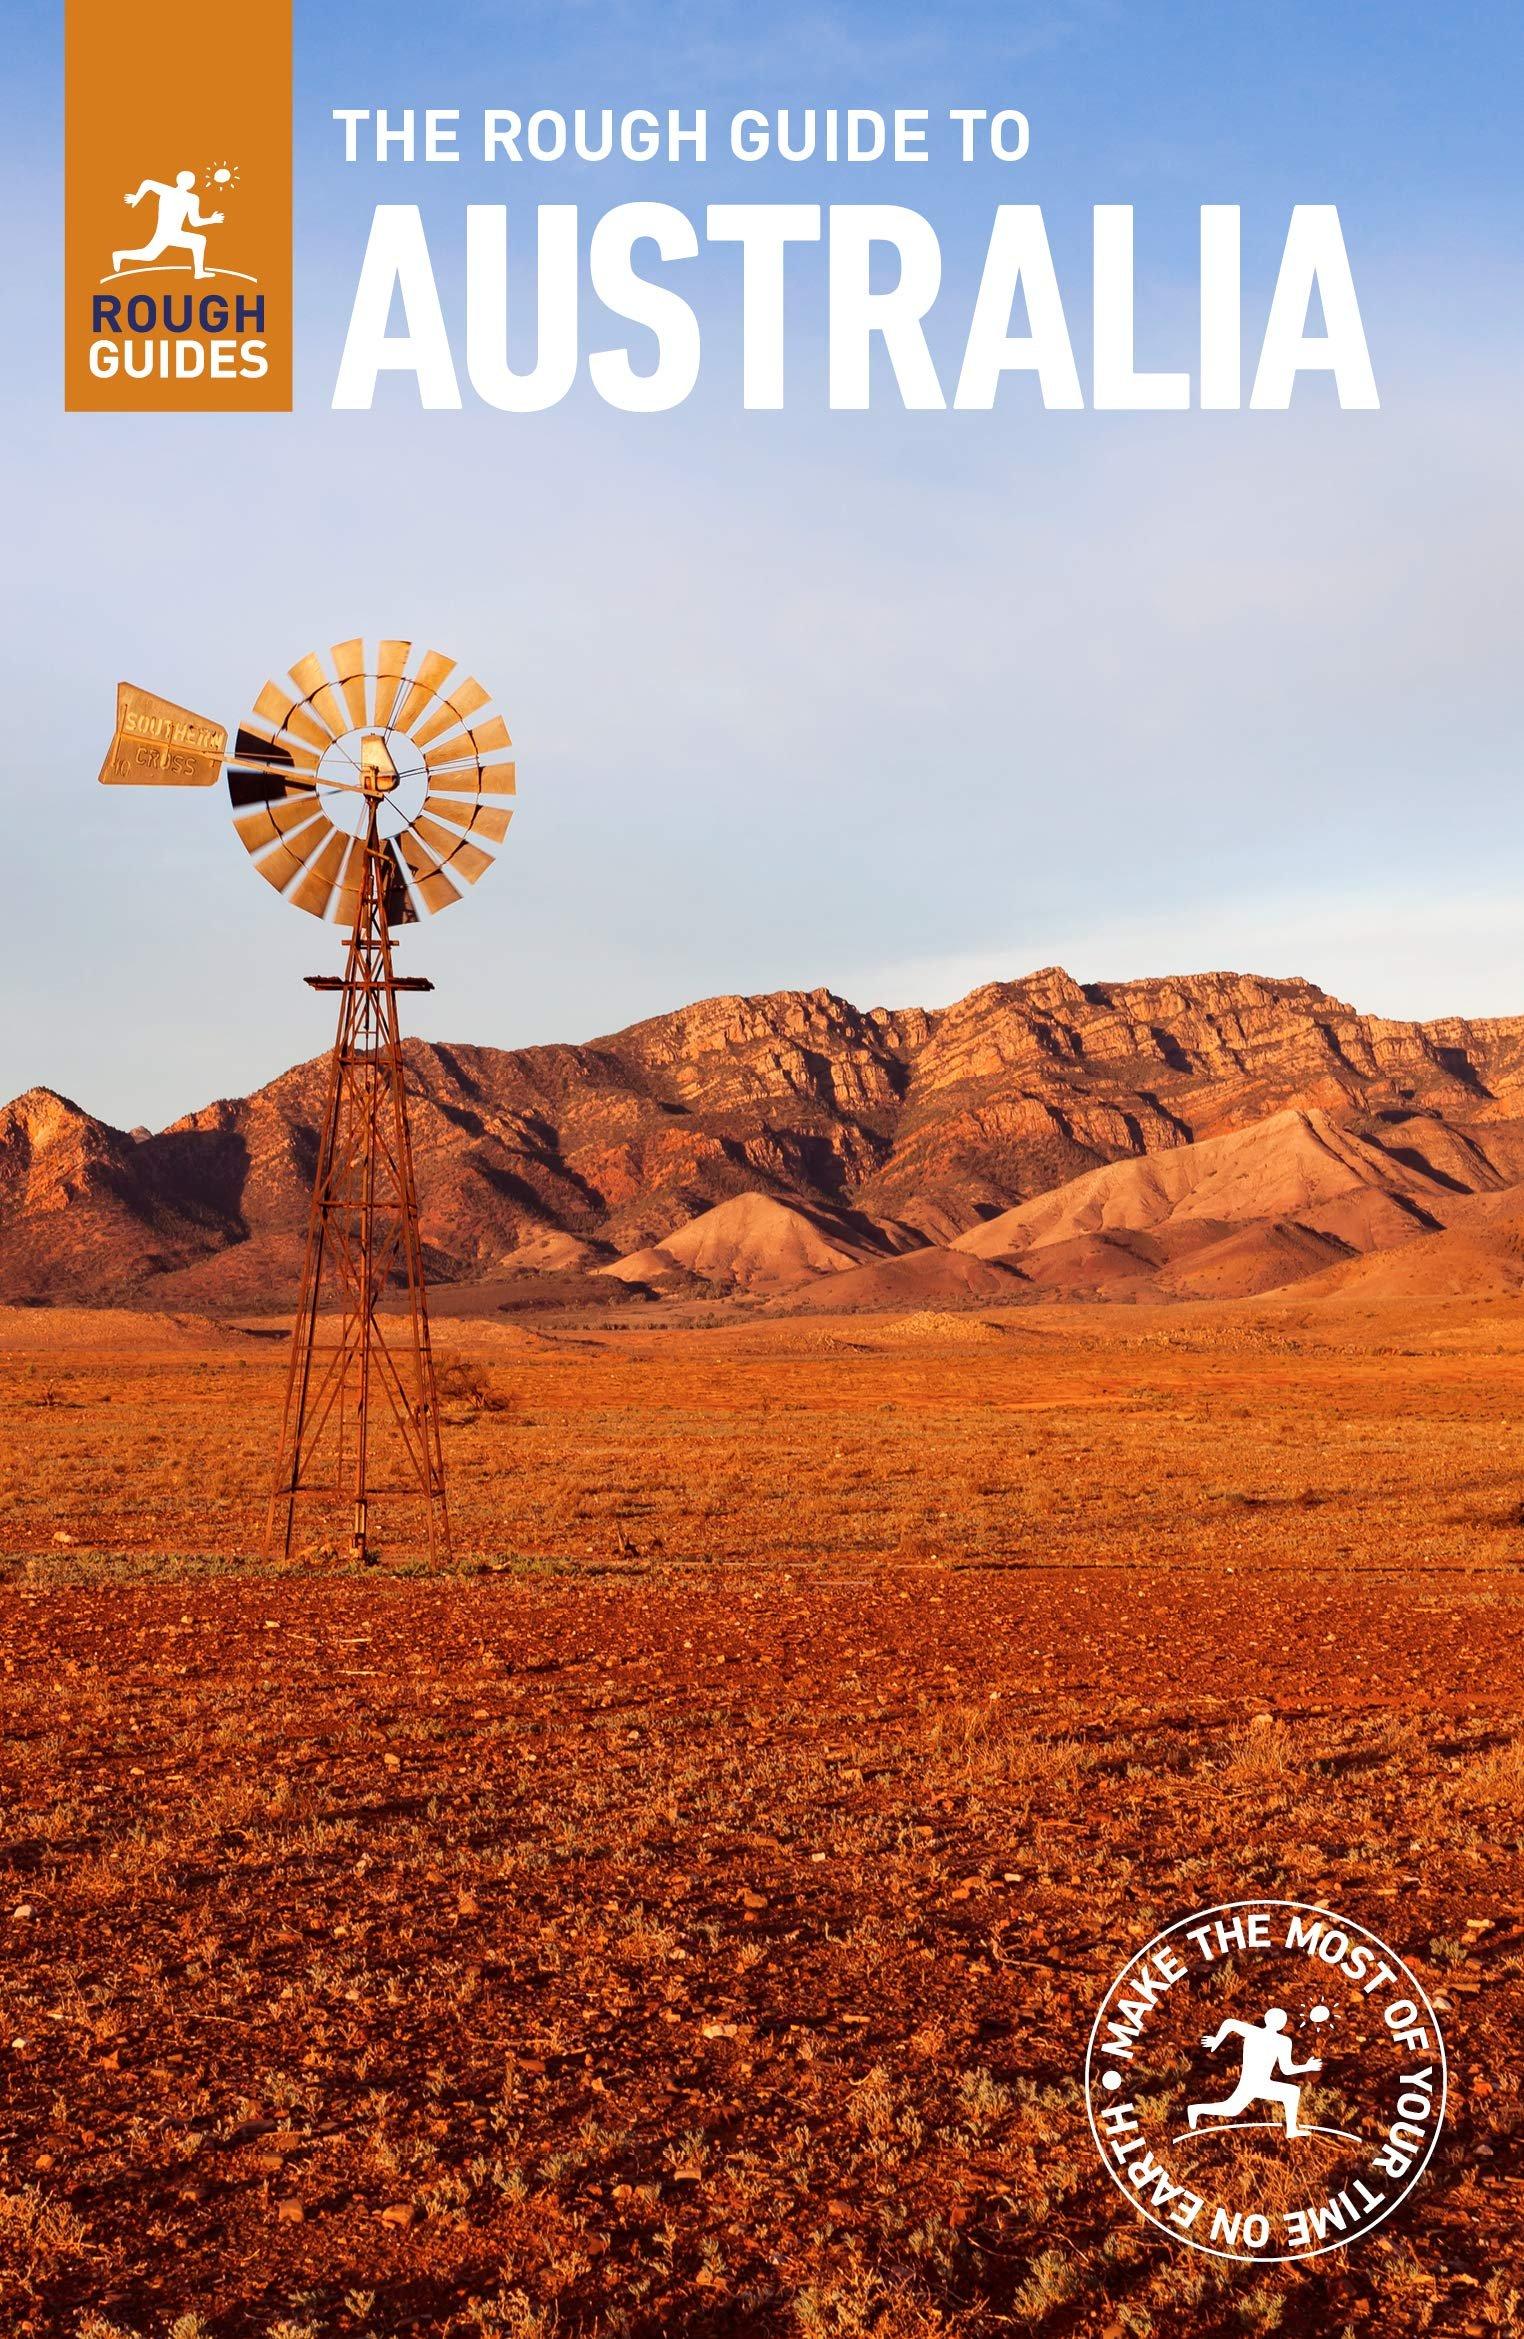 Rough Guide Australia 9781789194685  Rough Guide Rough Guides  Reisgidsen Australië